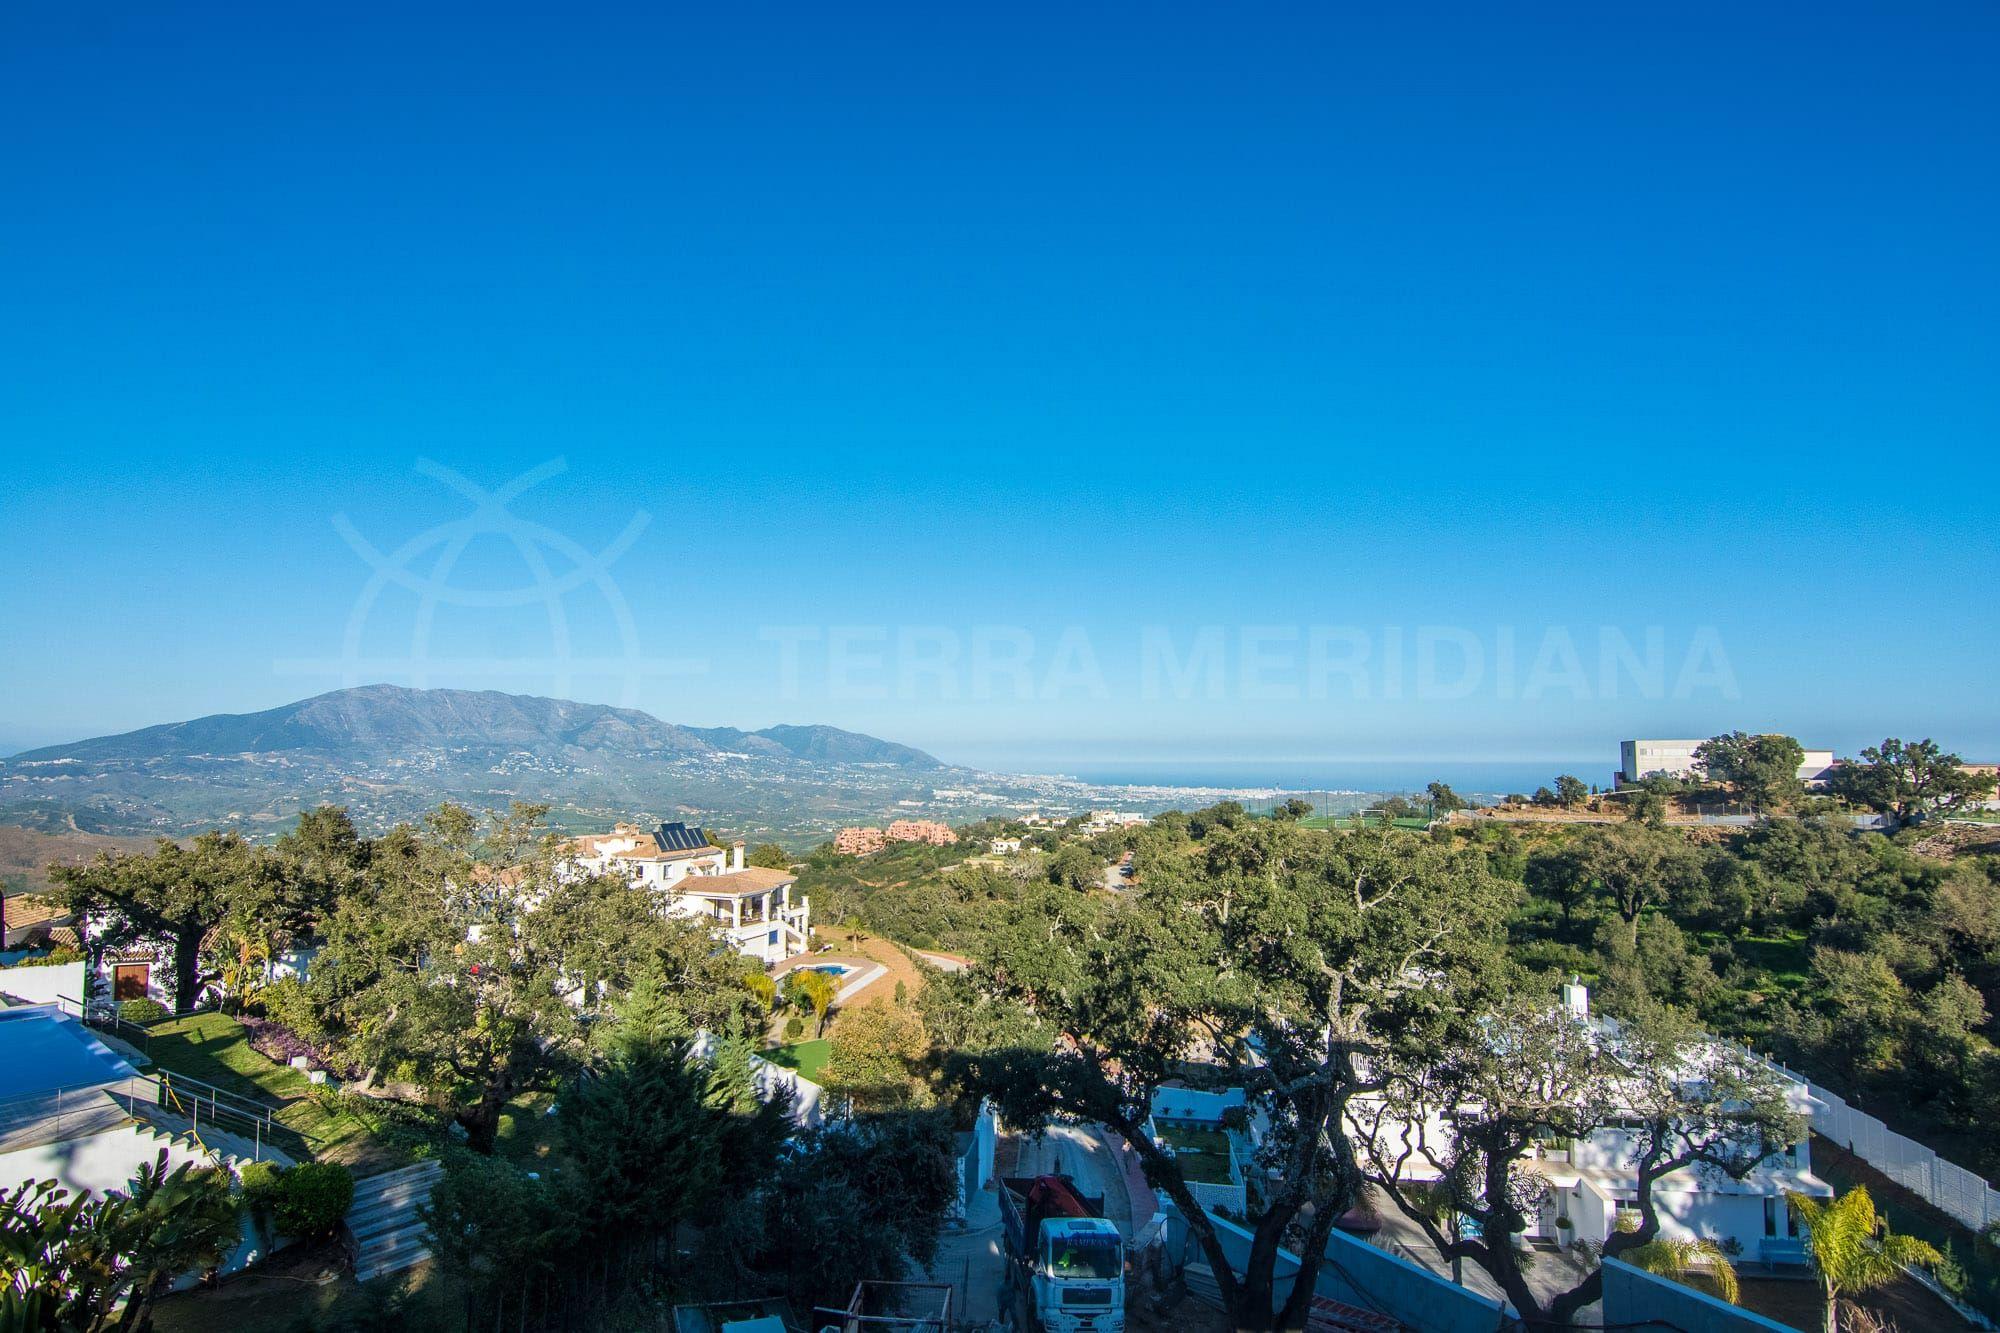 La Mairena – Dans les montagnes de Marbella